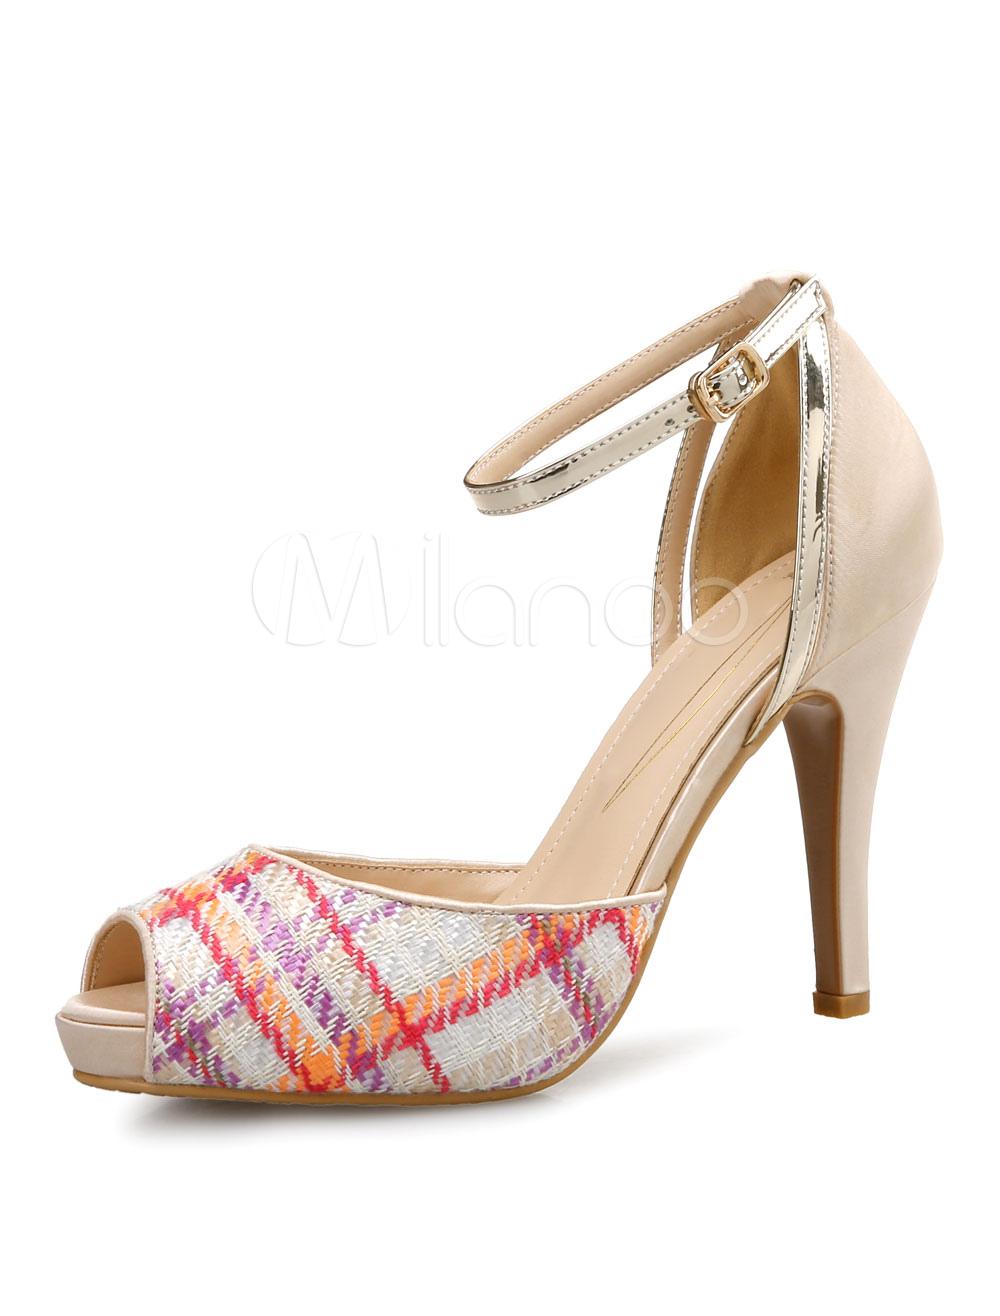 Zapatos de tacón de punter Peep Toe con dibujo retazados de tacón de stiletto m31bxXJ1T